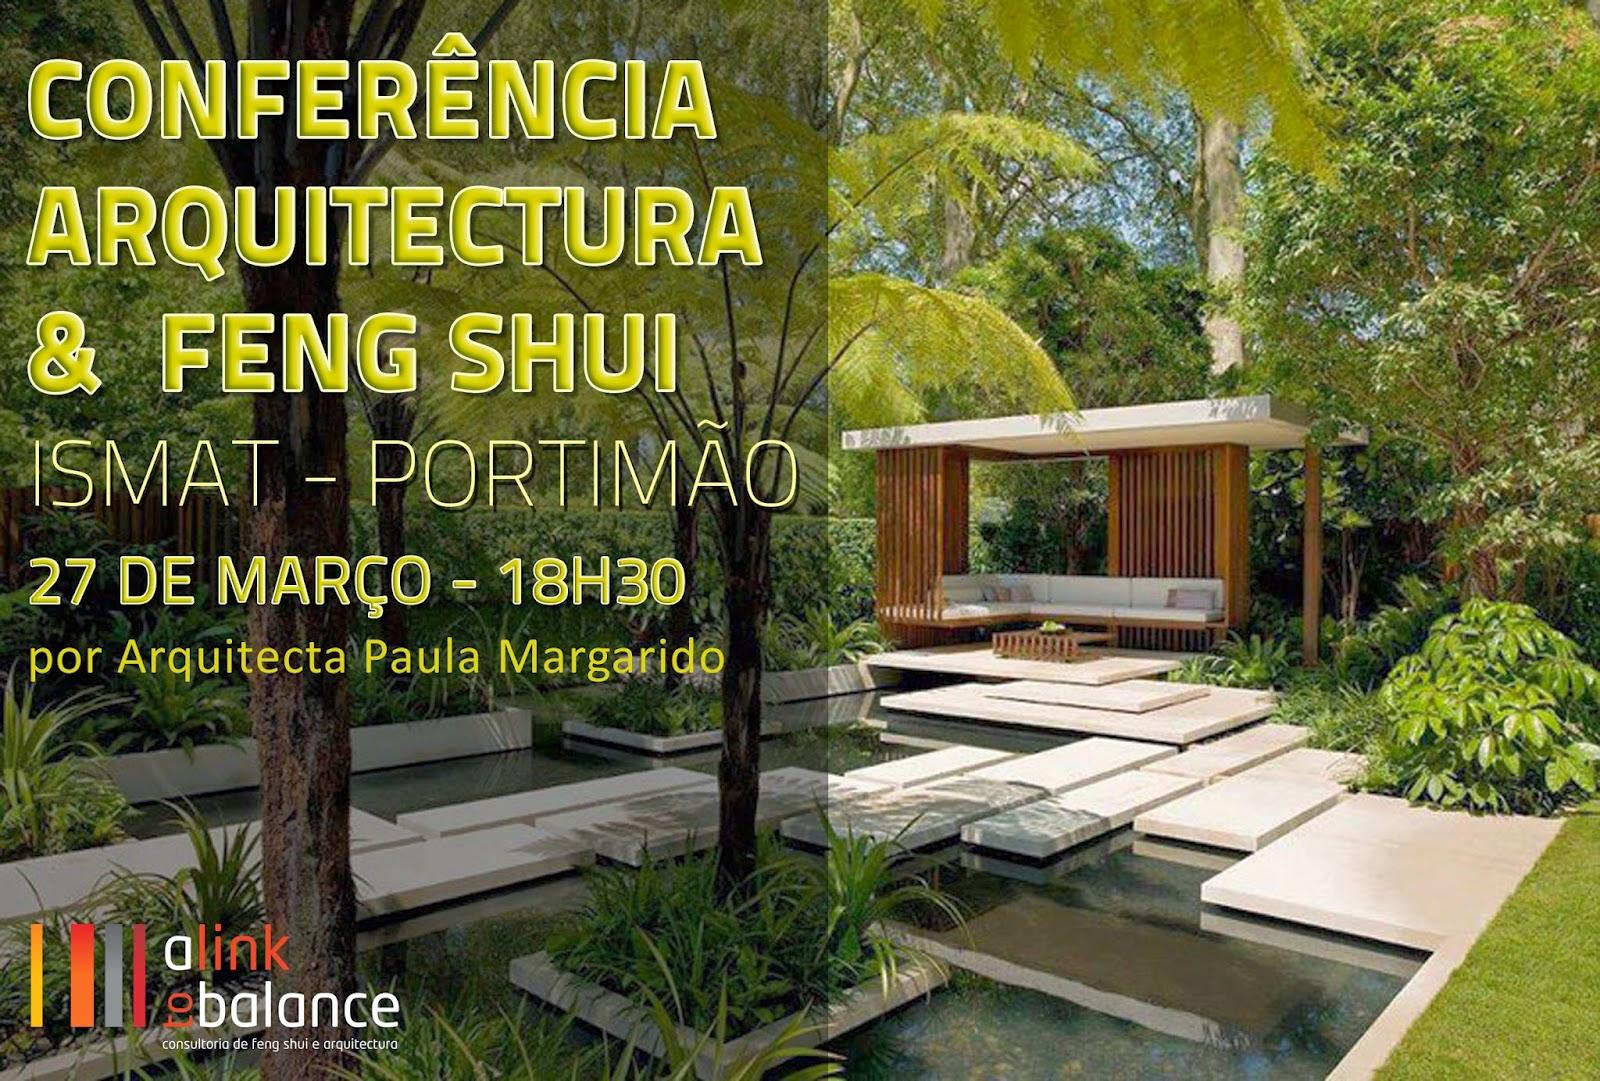 A link to balance arquitectura e feng shui confer ncia - Arquitectura feng shui ...